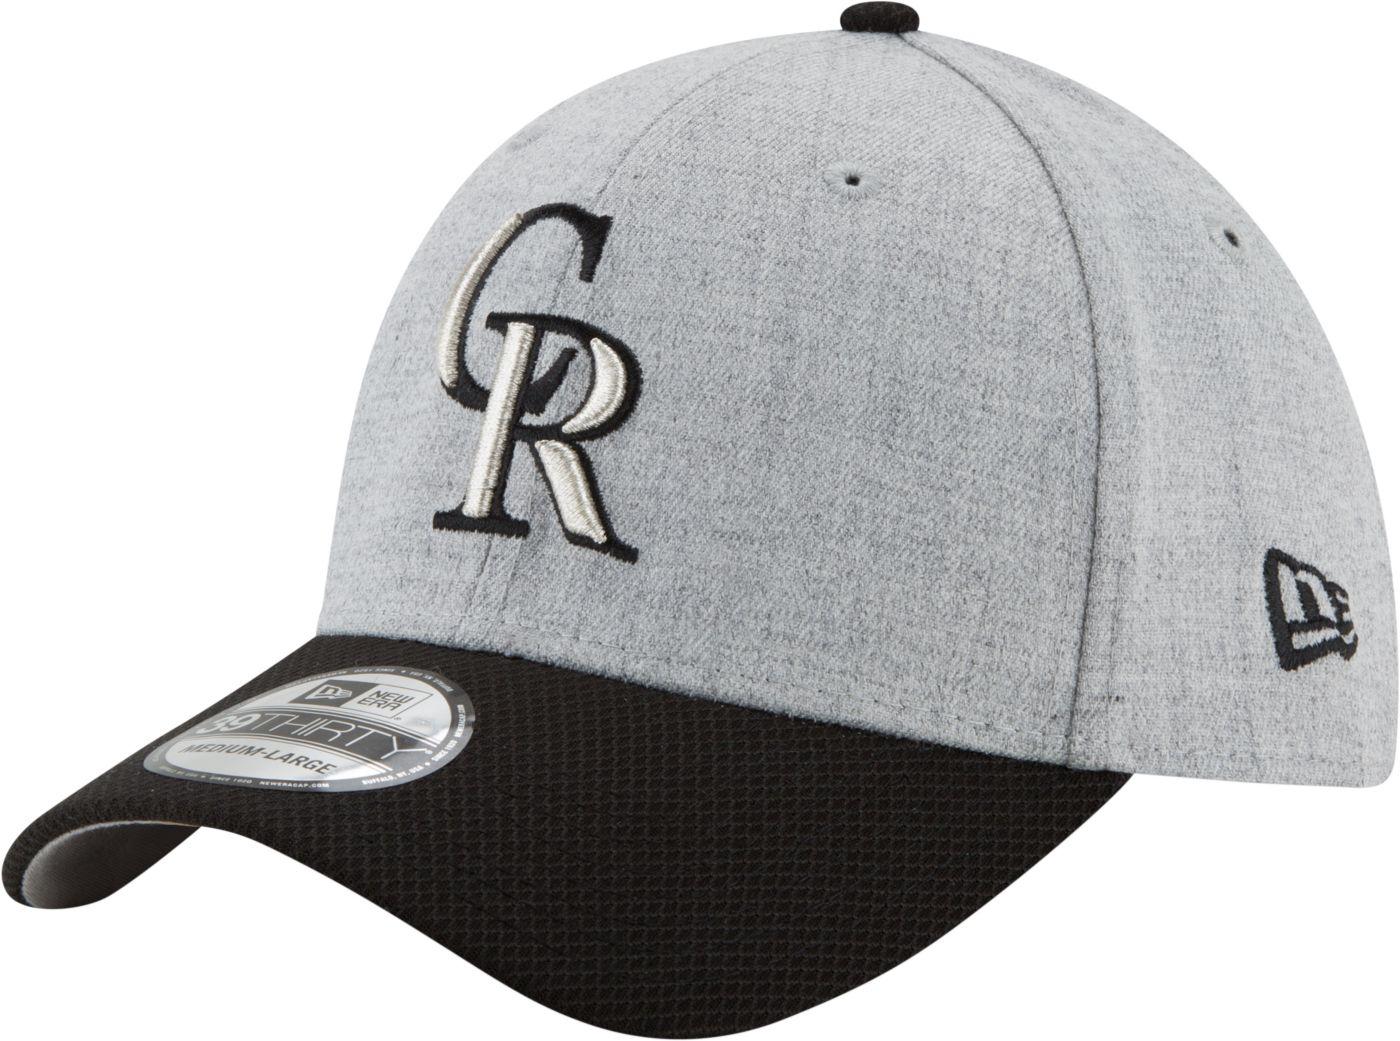 New Era Men's Colorado Rockies 39Thirty Change Up Redux Grey Stretch Fit Hat